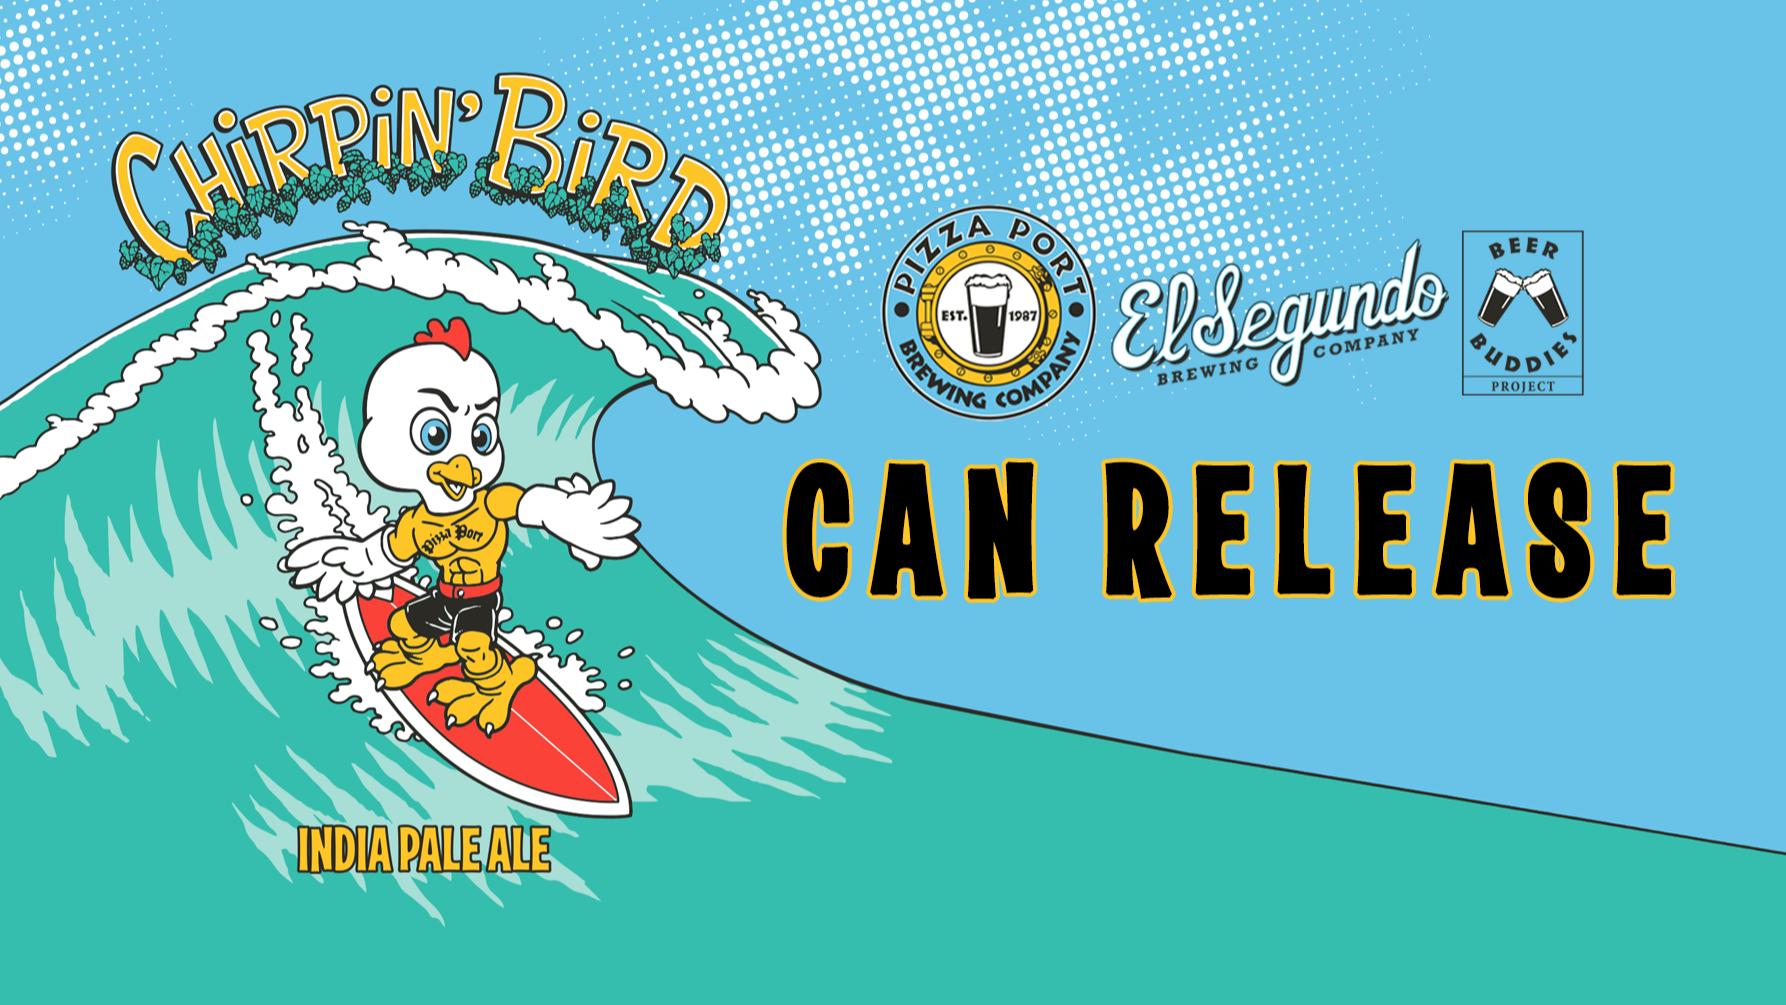 Chirpin' Bird IPA Can Release